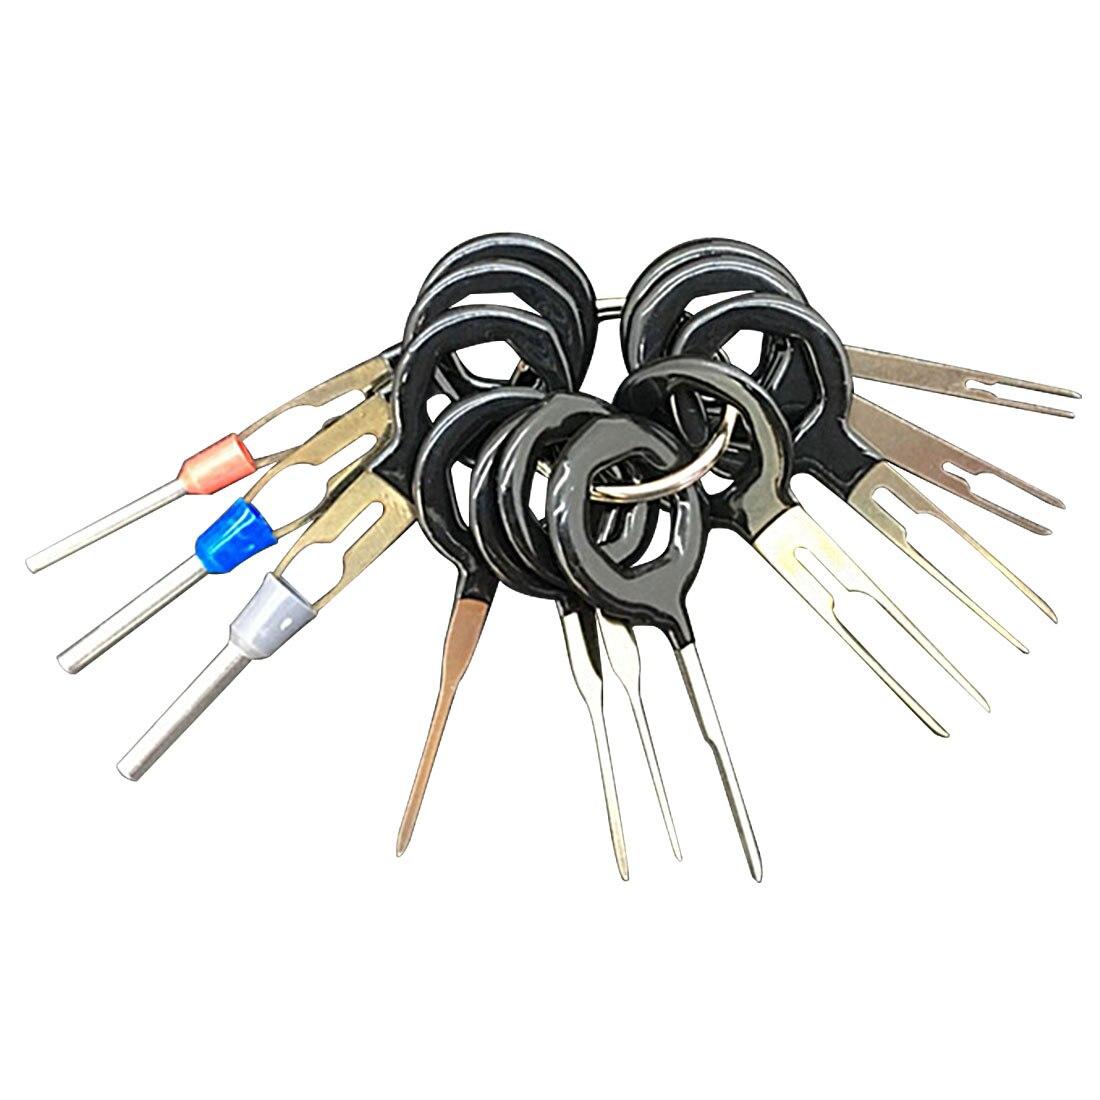 11Pcs/Set Terminal Removal Tools Car Electrical Wiring Crimp Connector Pin Extractor Kit Car Repair Hand Tool Set Plug Key